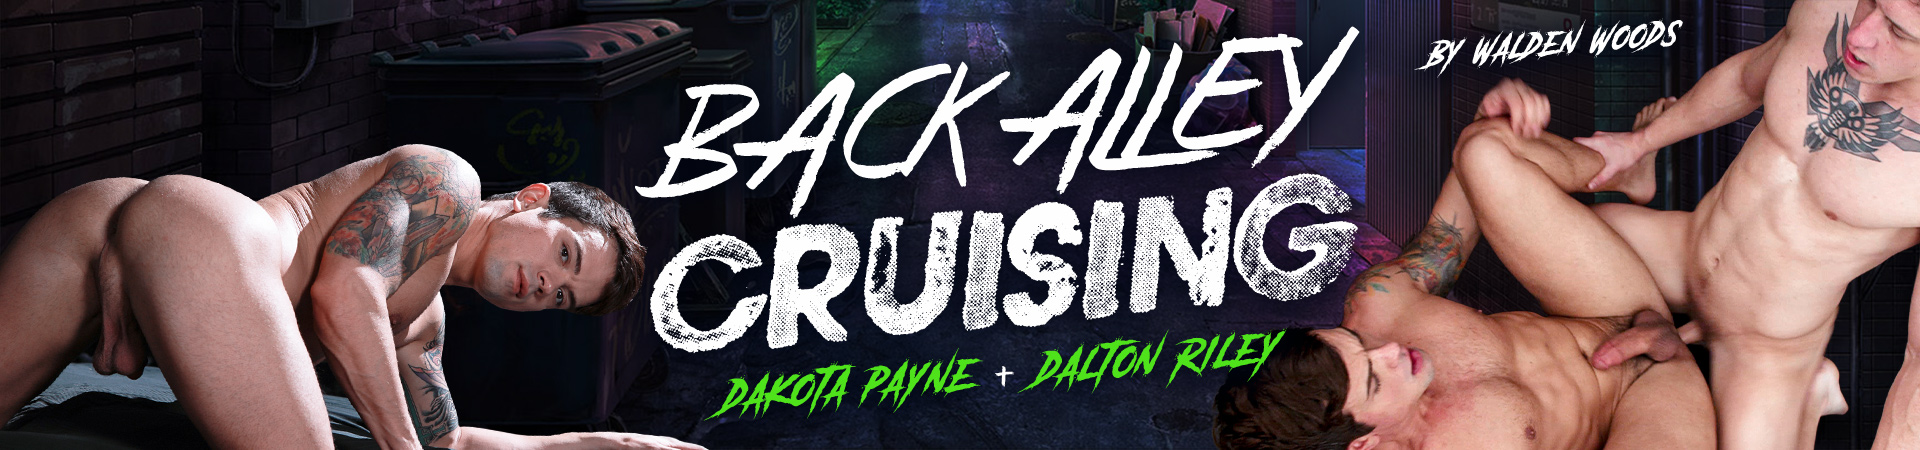 Back Alley Cruising Featuring Dakota Payne and Dalton Riley